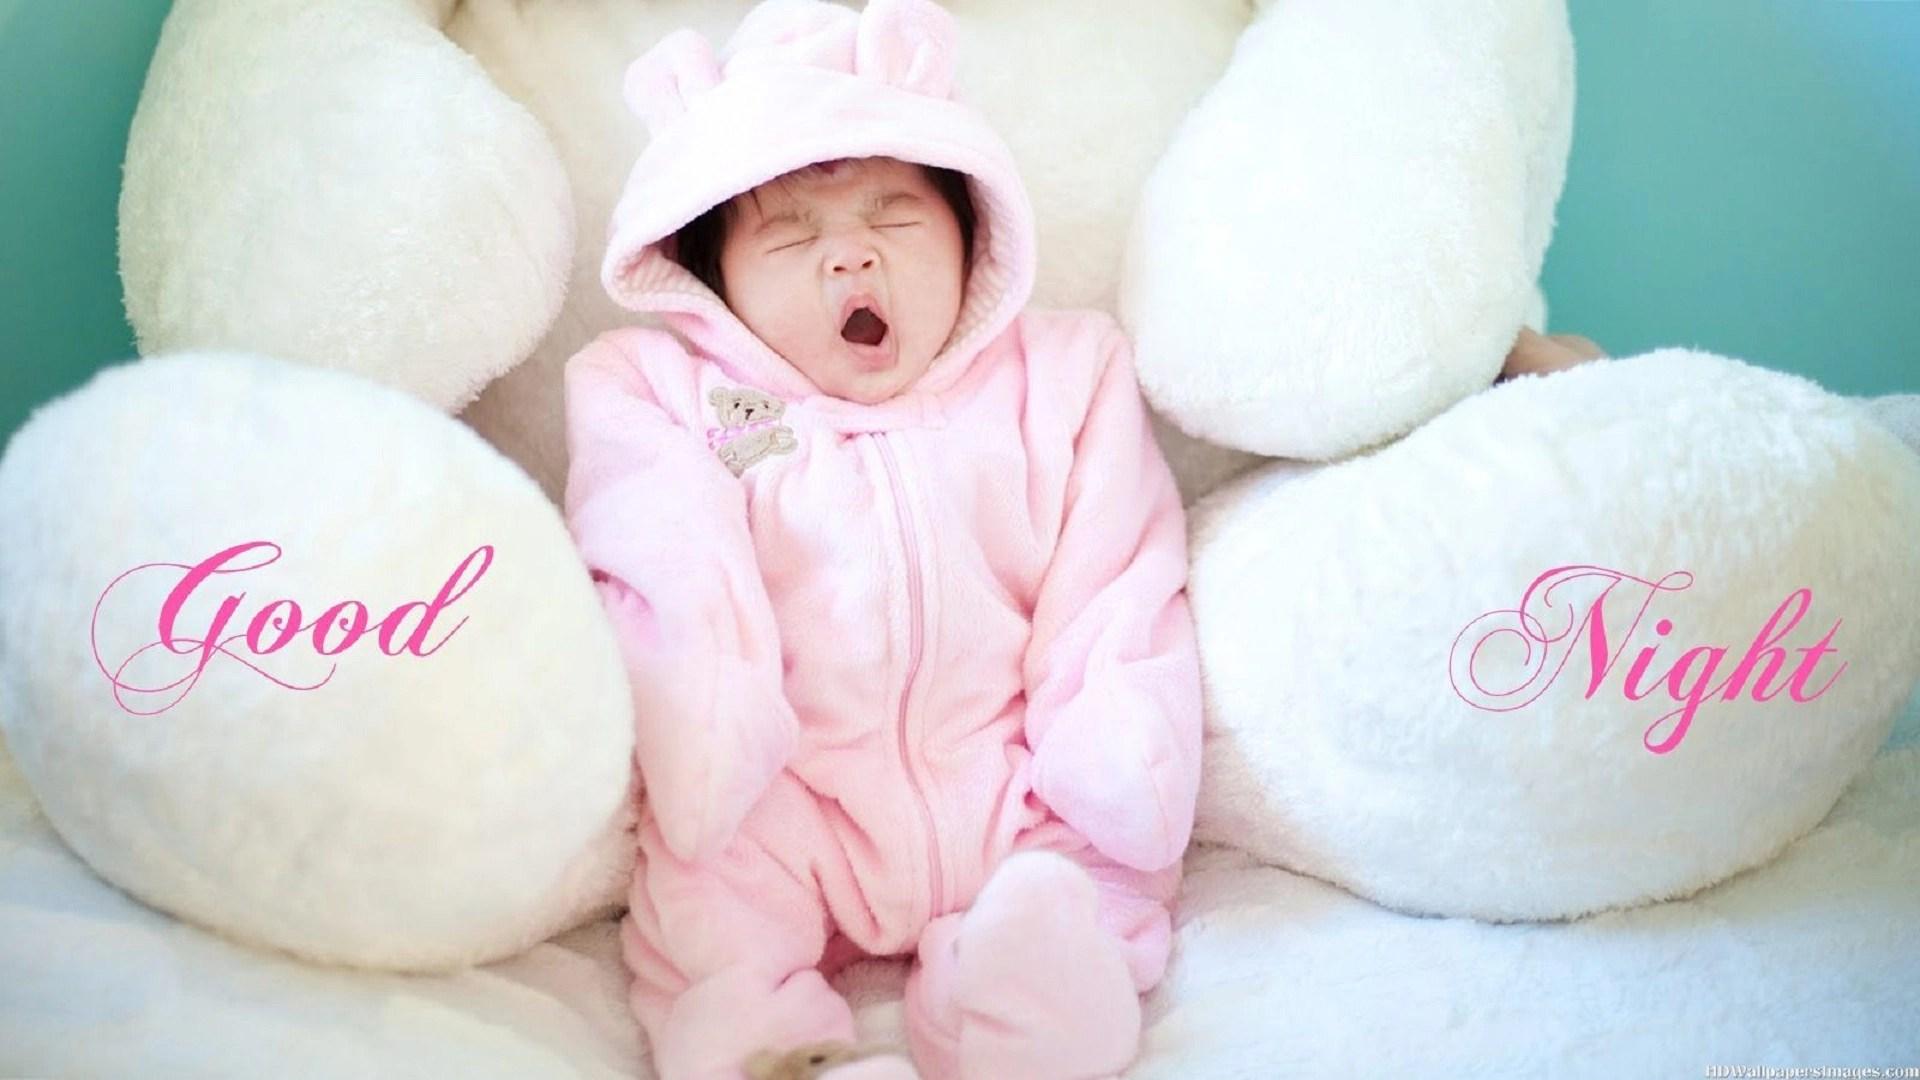 good night baby yawning image